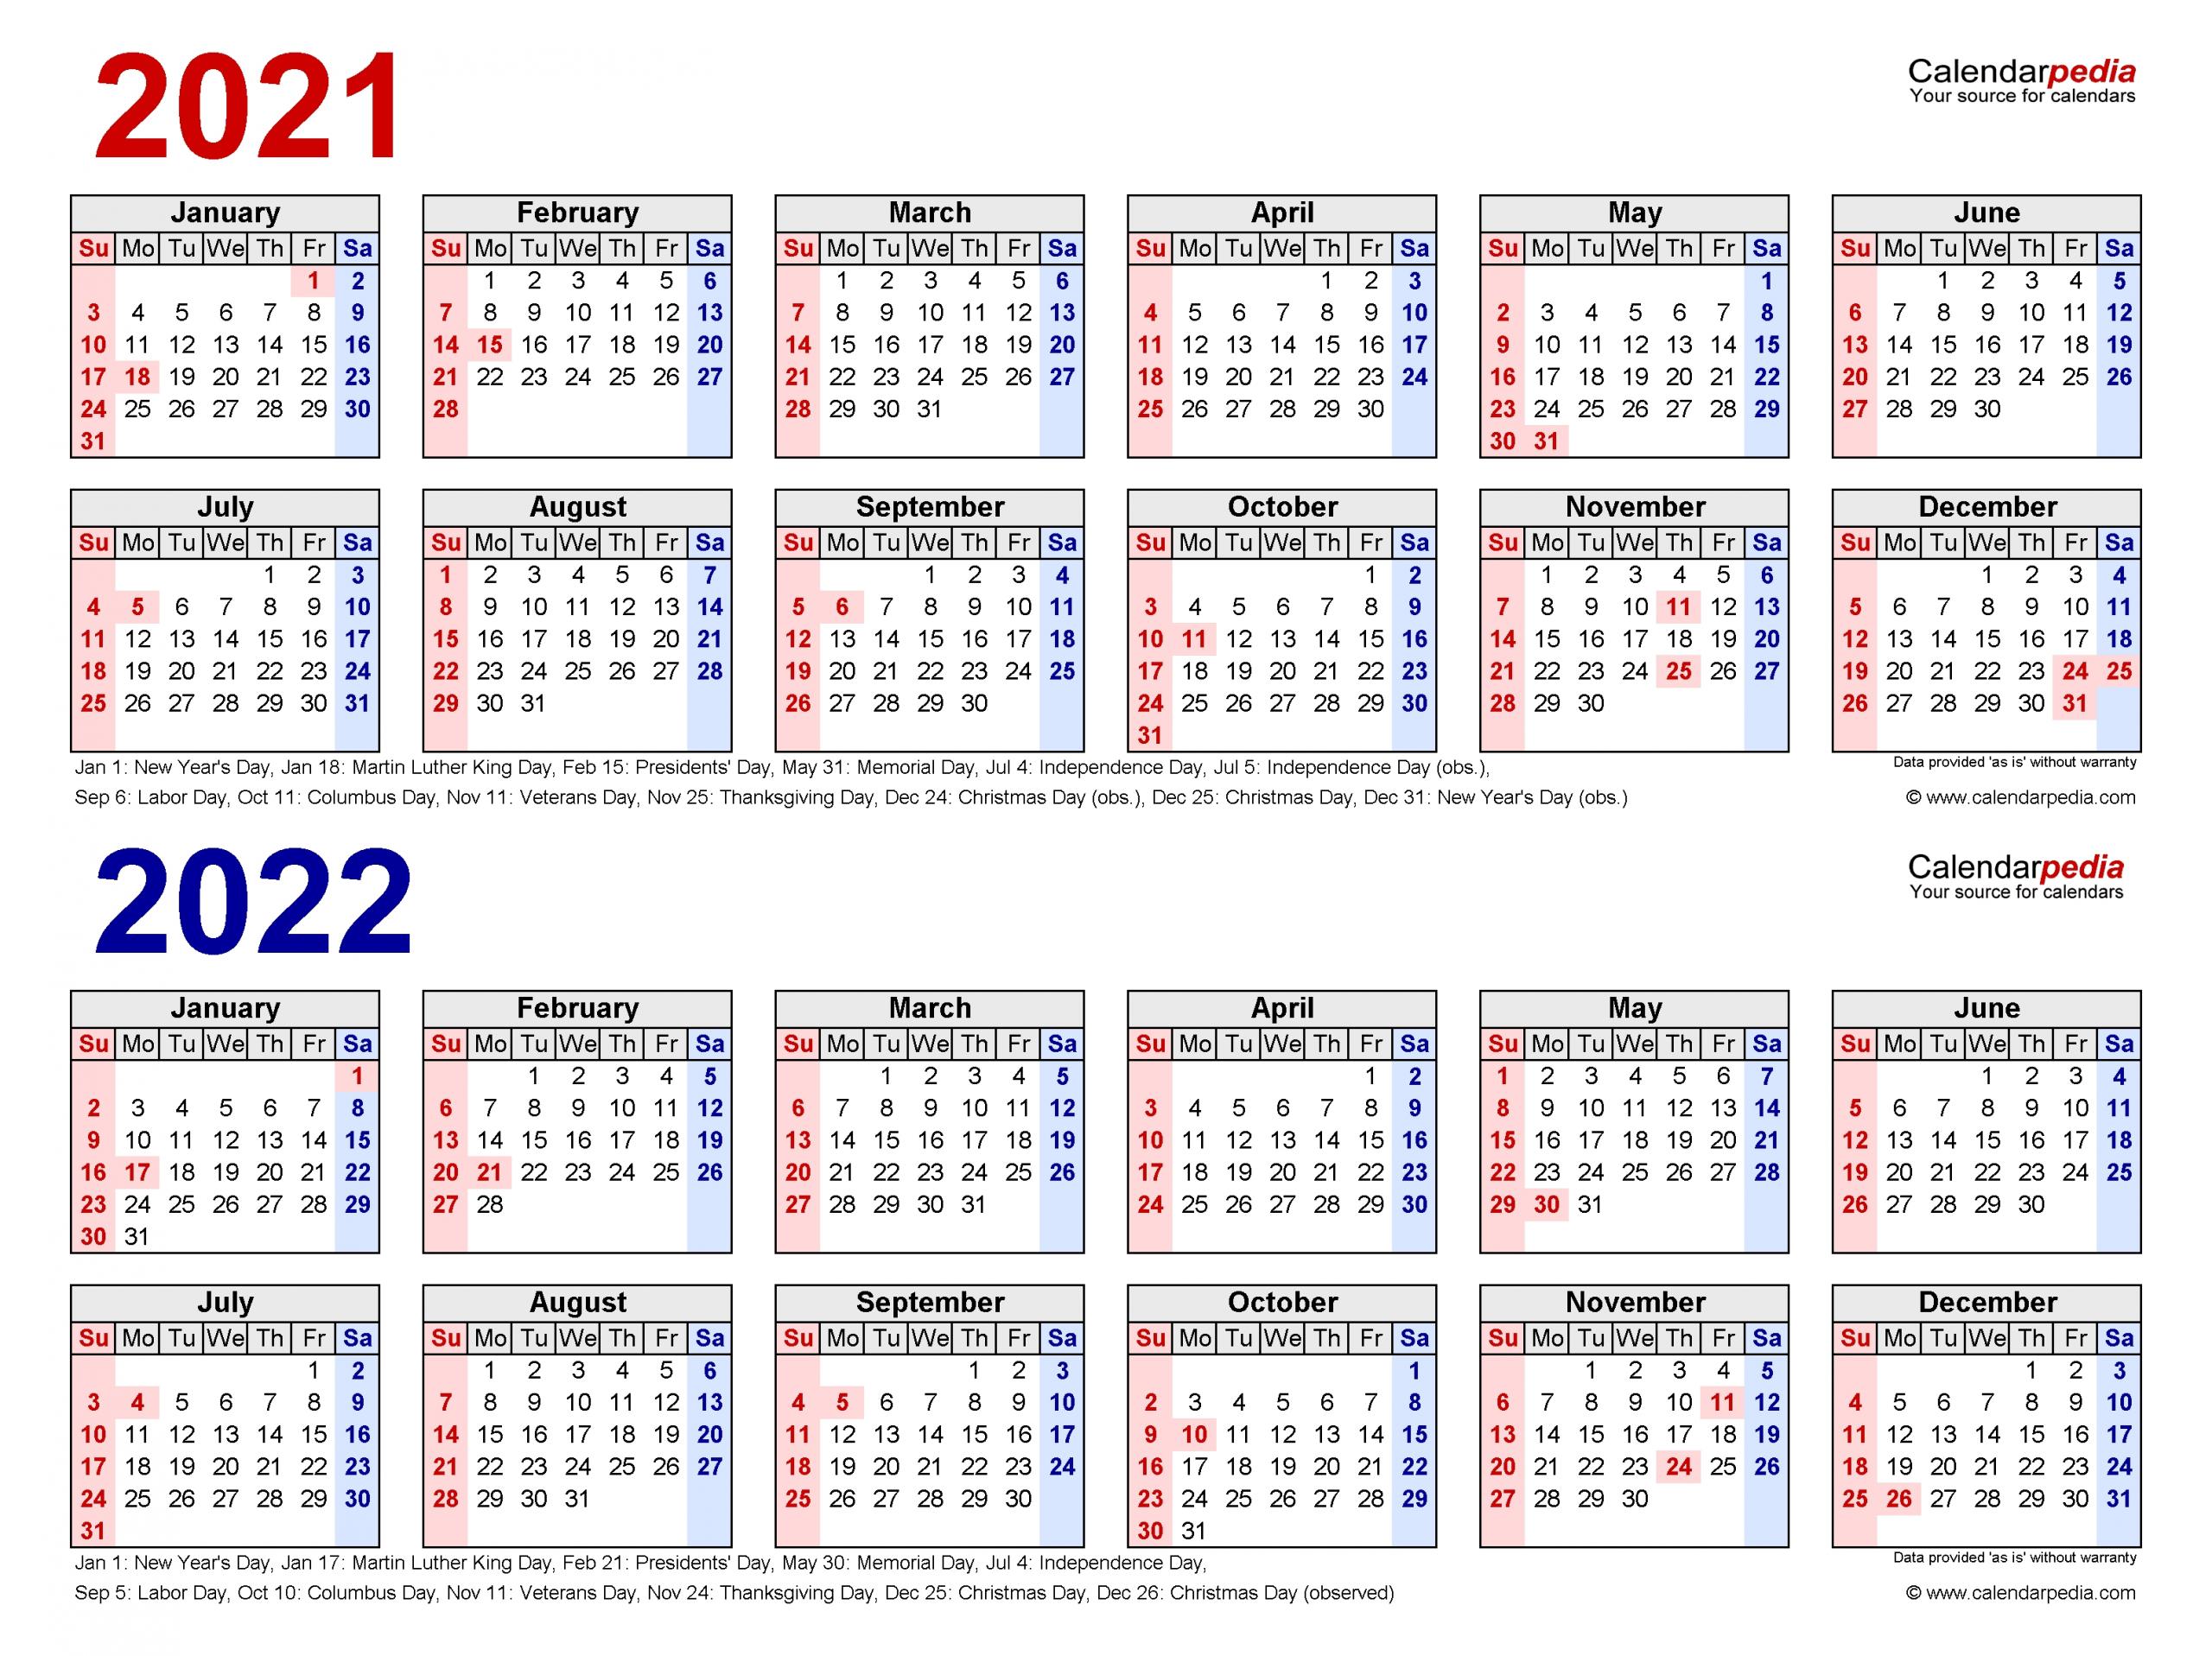 2021-2022 Two Year Calendar - Free Printable Excel Templates  Checkbook Size Calendar Printable